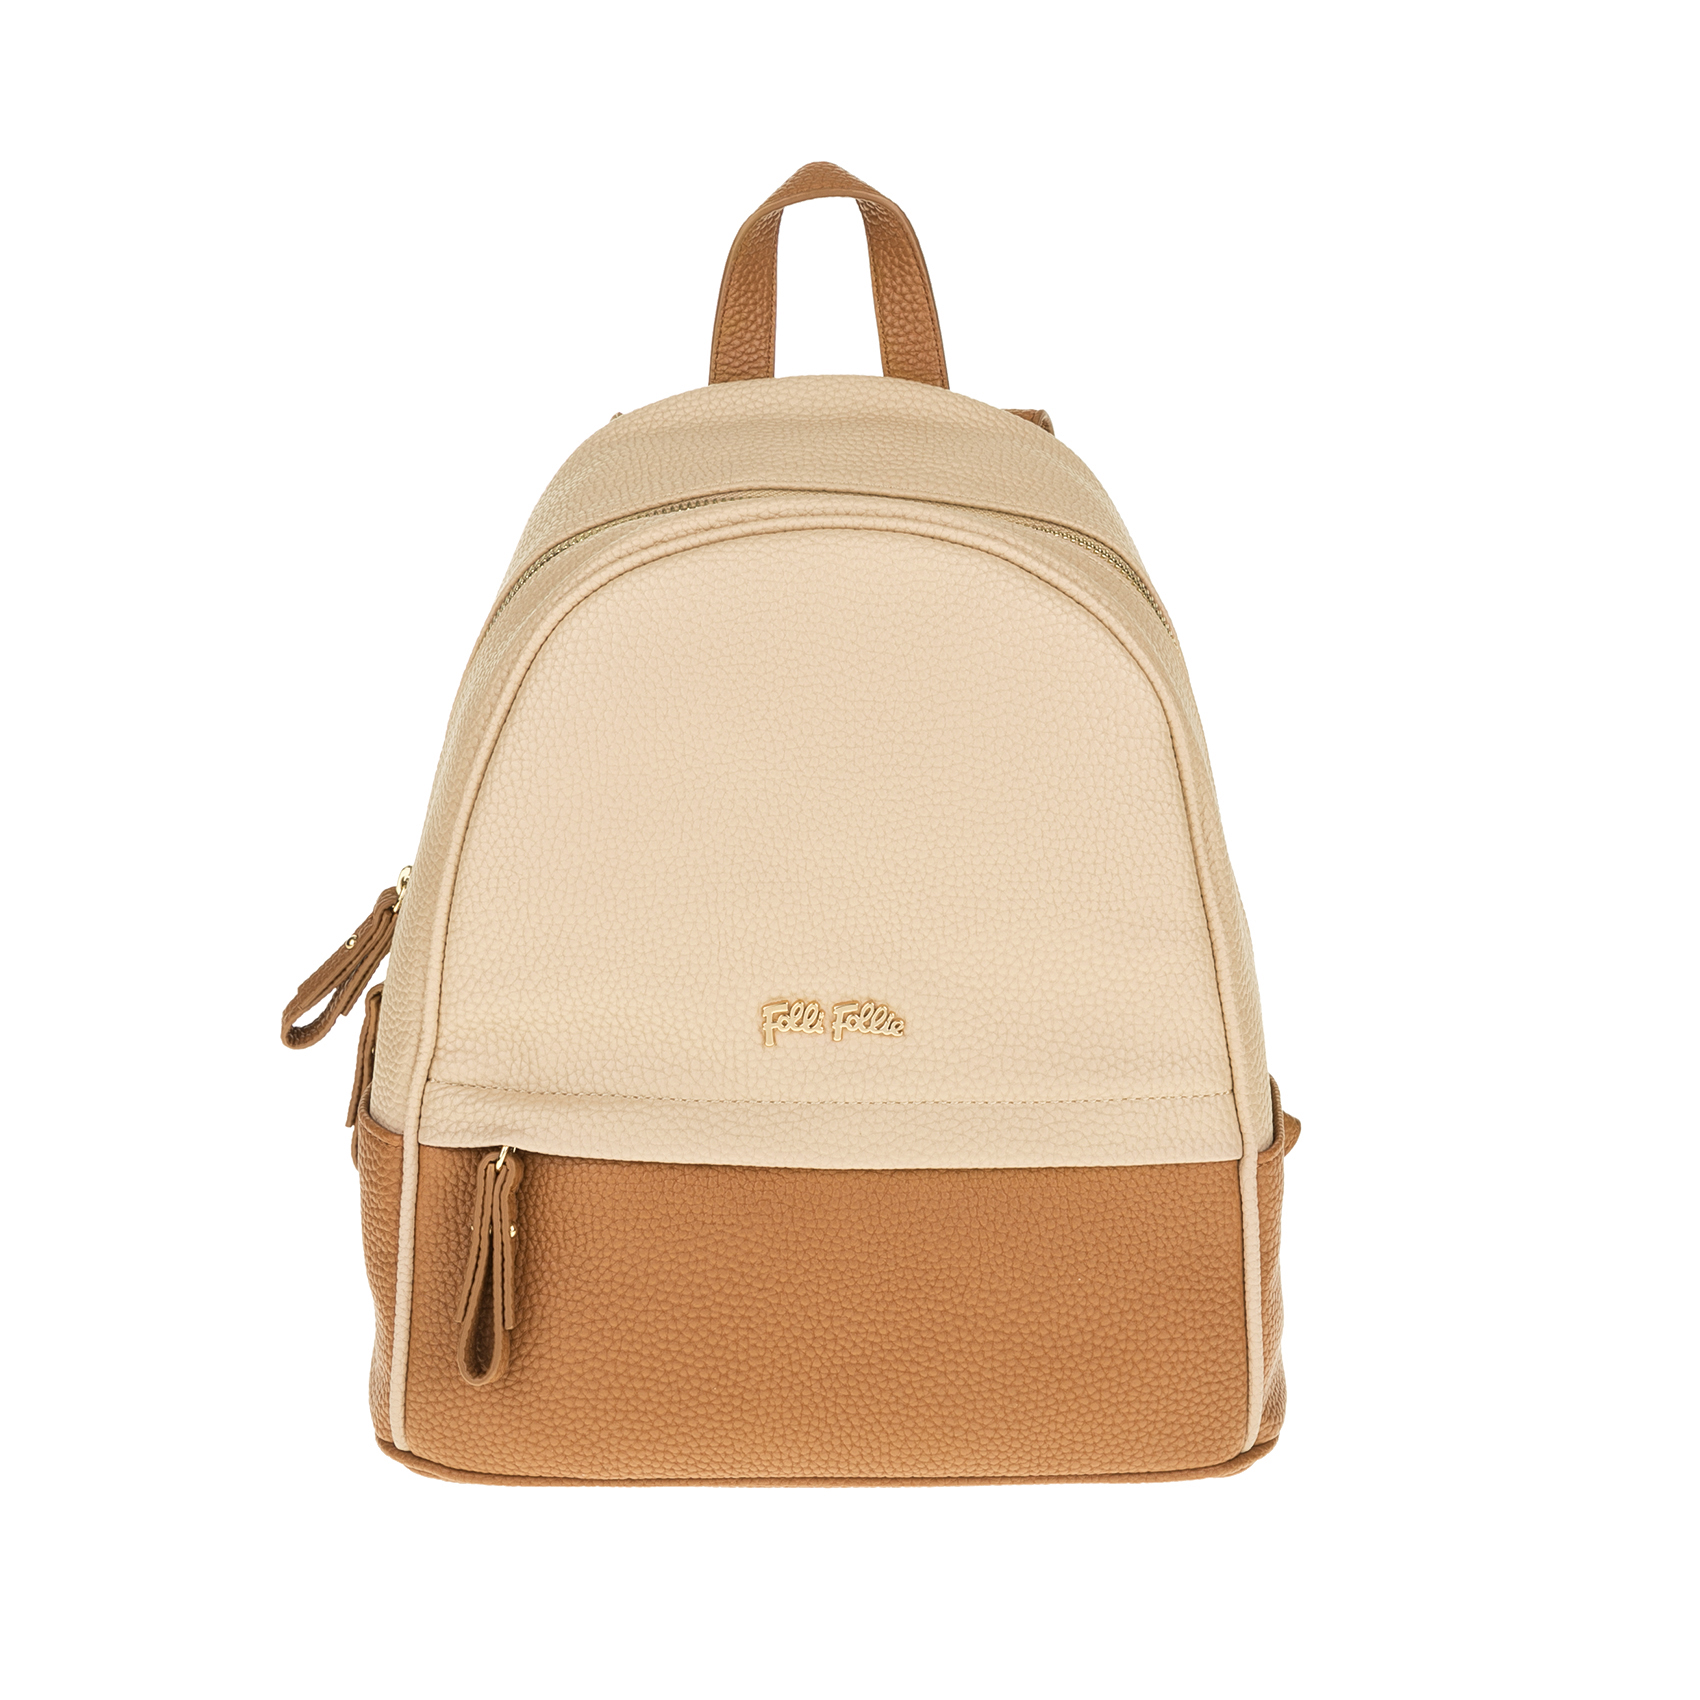 FOLLI FOLLIE – Γυναικεία τσάντα πλάτης FOLLI FOLLIE μπεζ-καφέ 1619083.0-0000